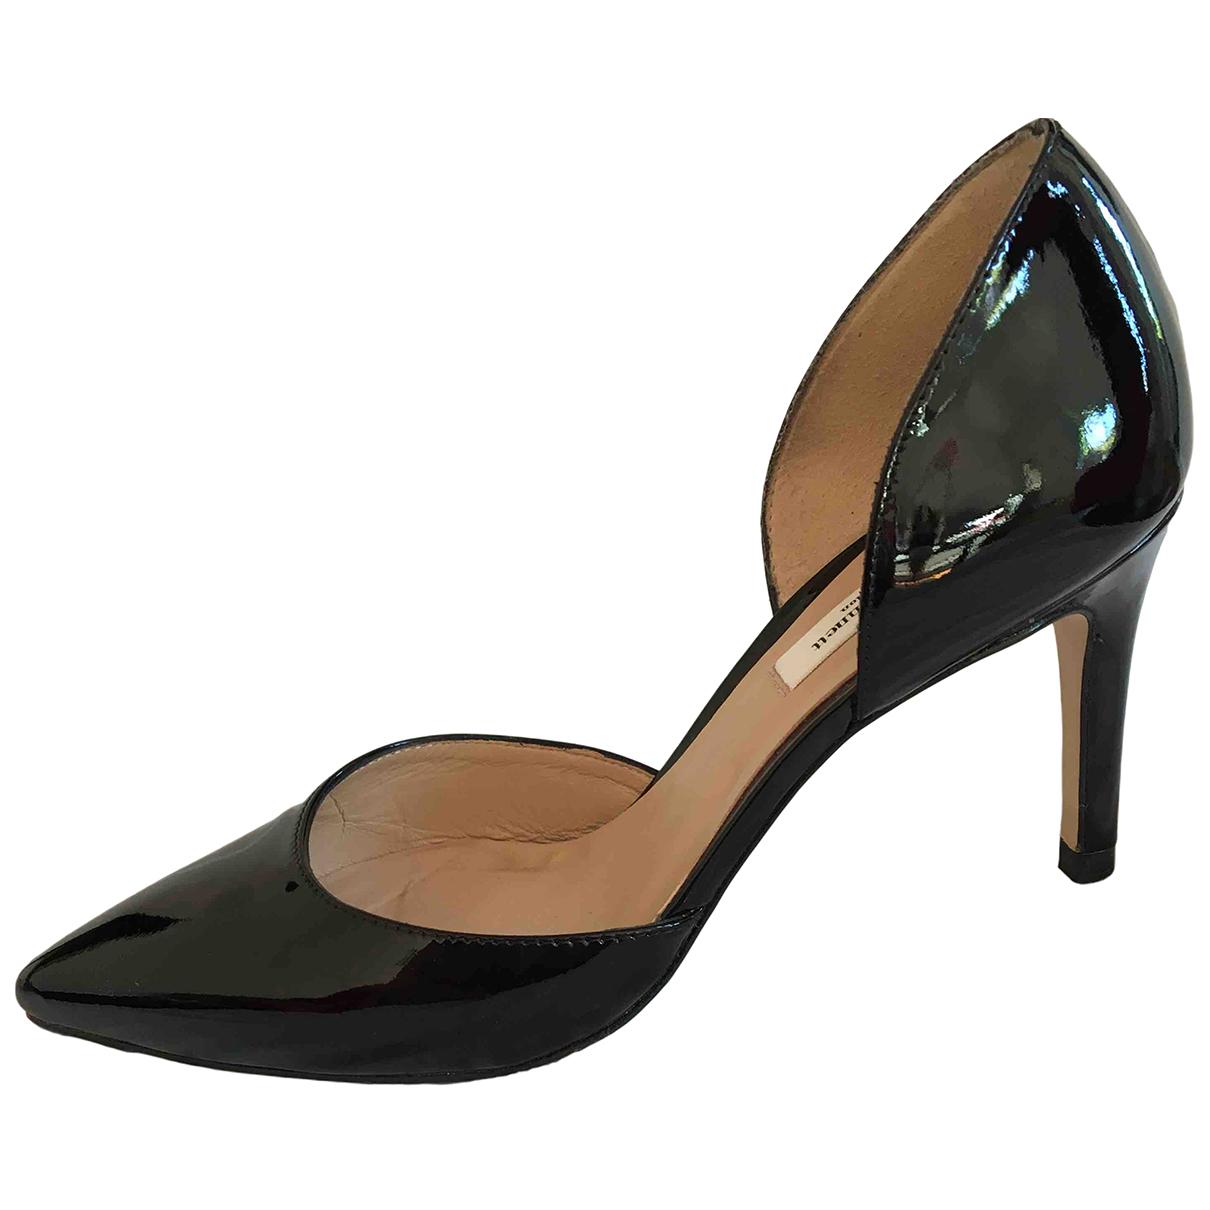 Lk Bennett \N Black Patent leather Heels for Women 37.5 EU